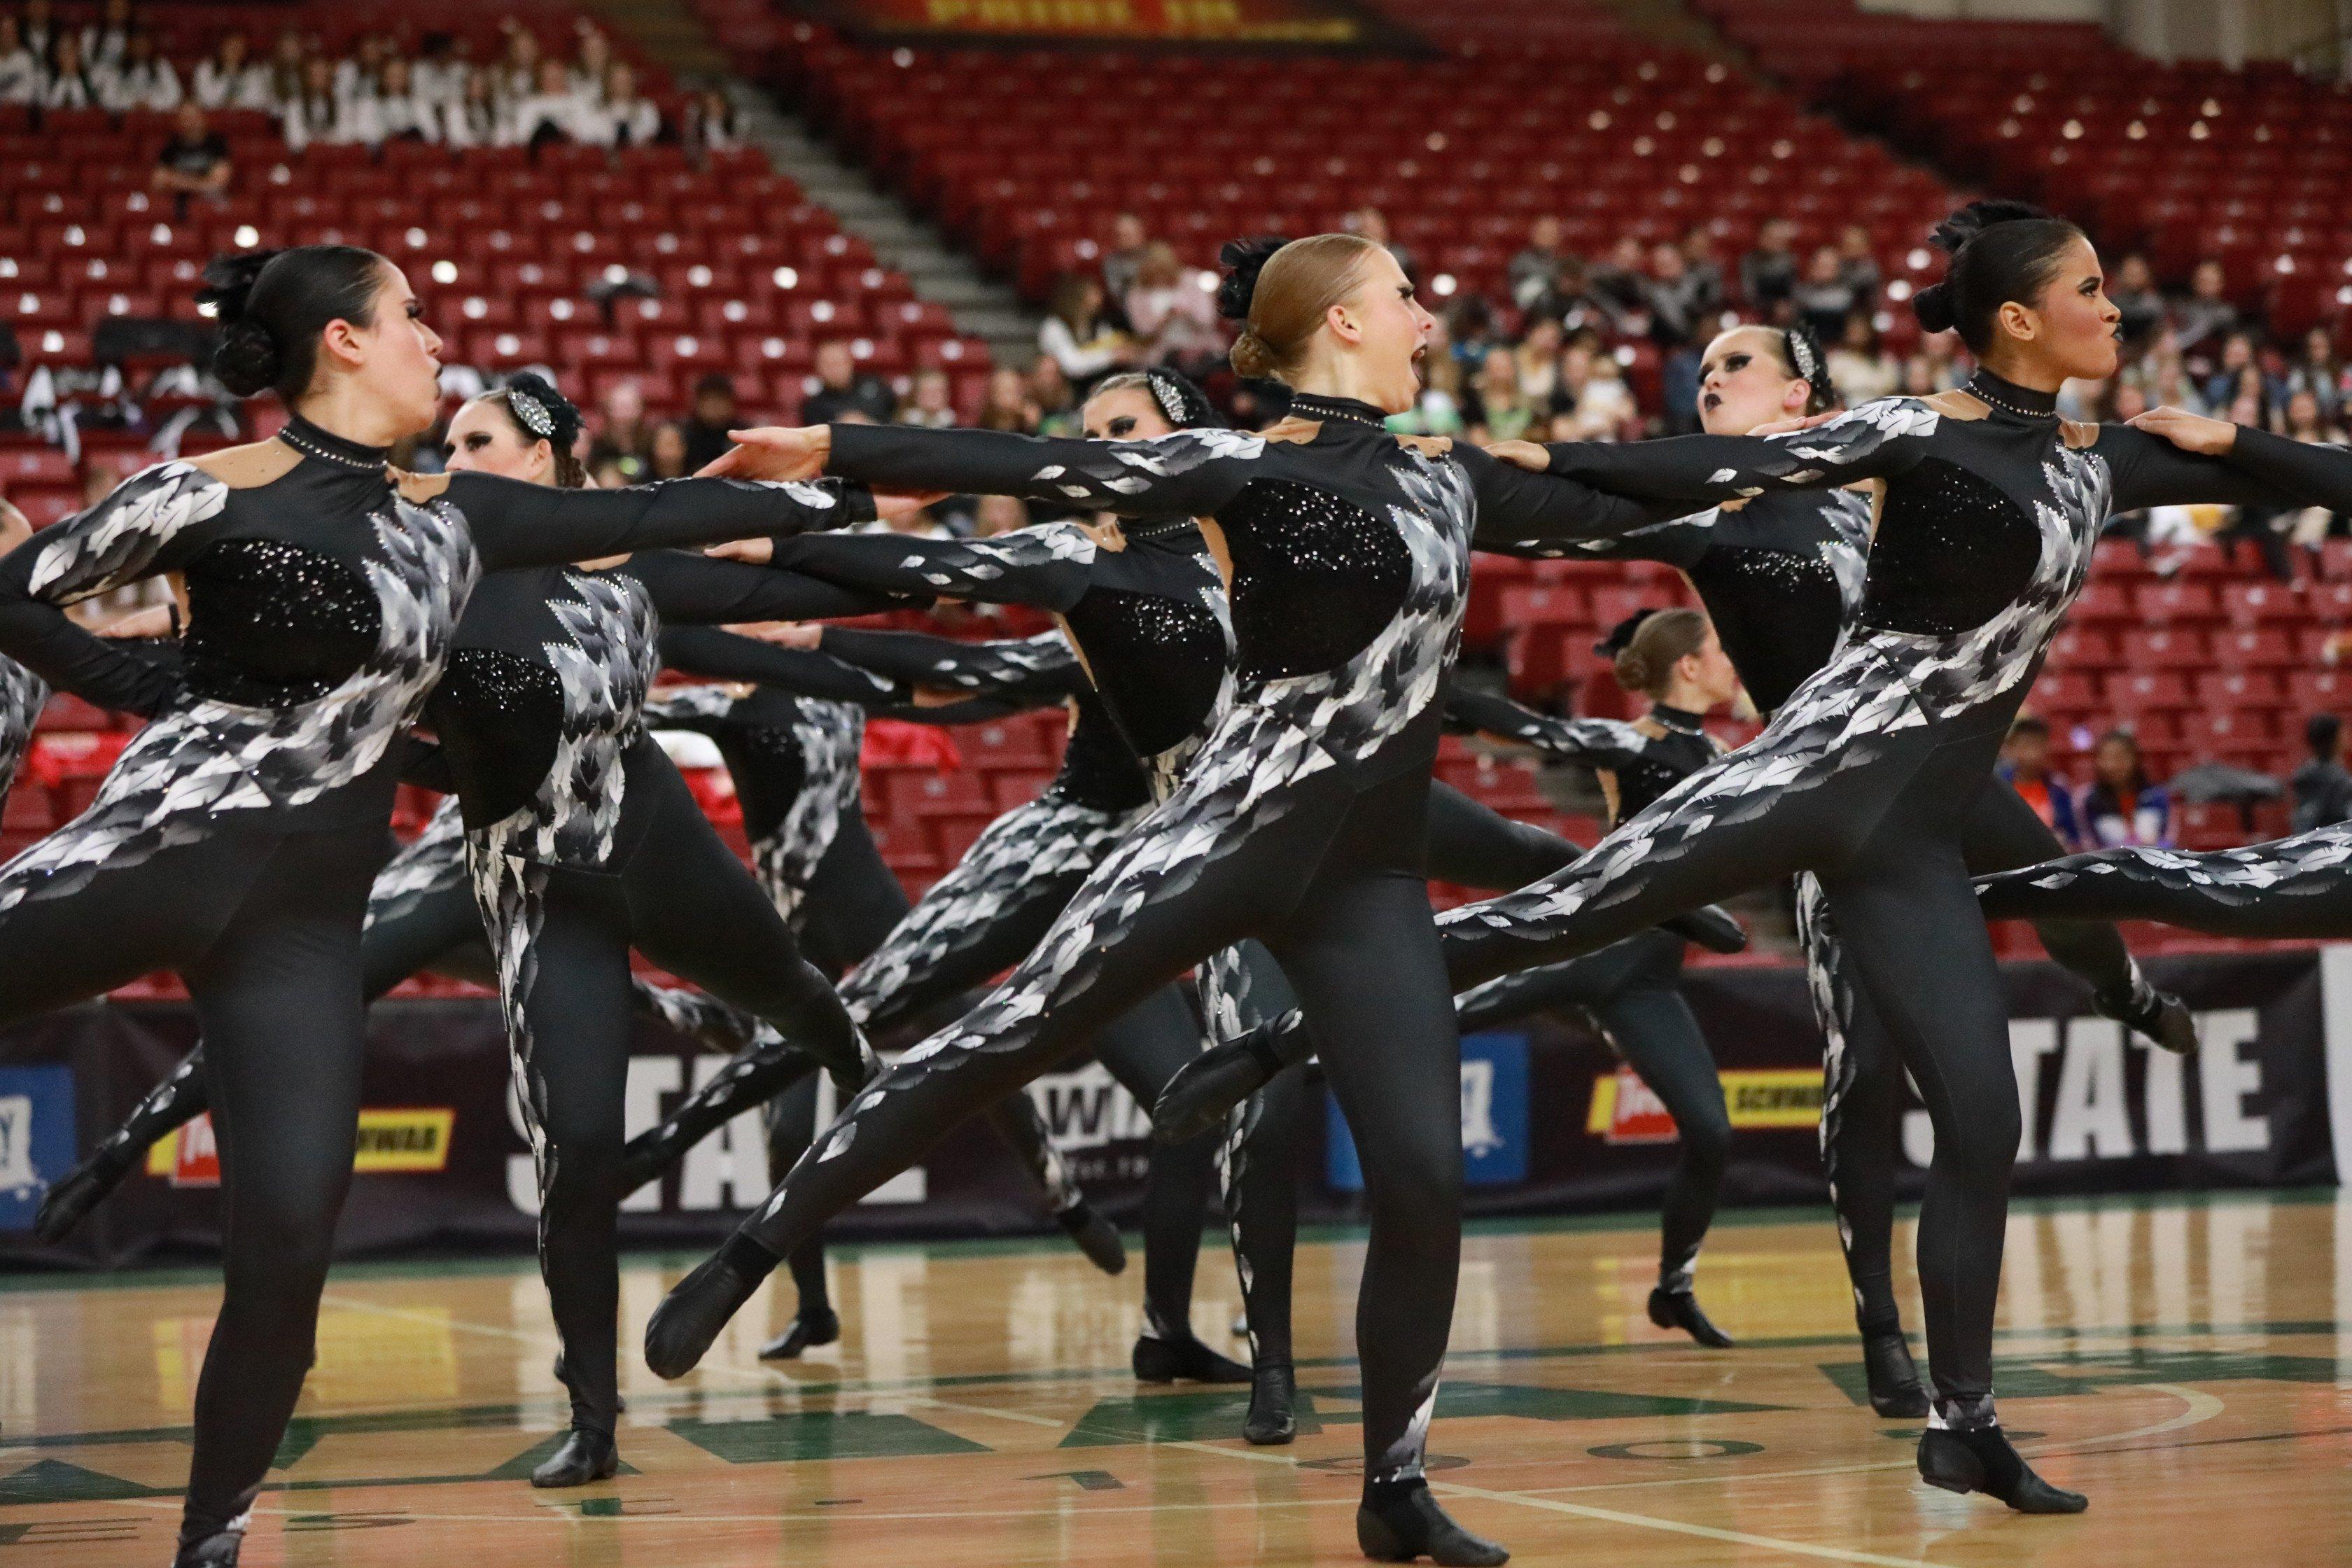 Liberty High School Washington State Dance Competition Kick costume